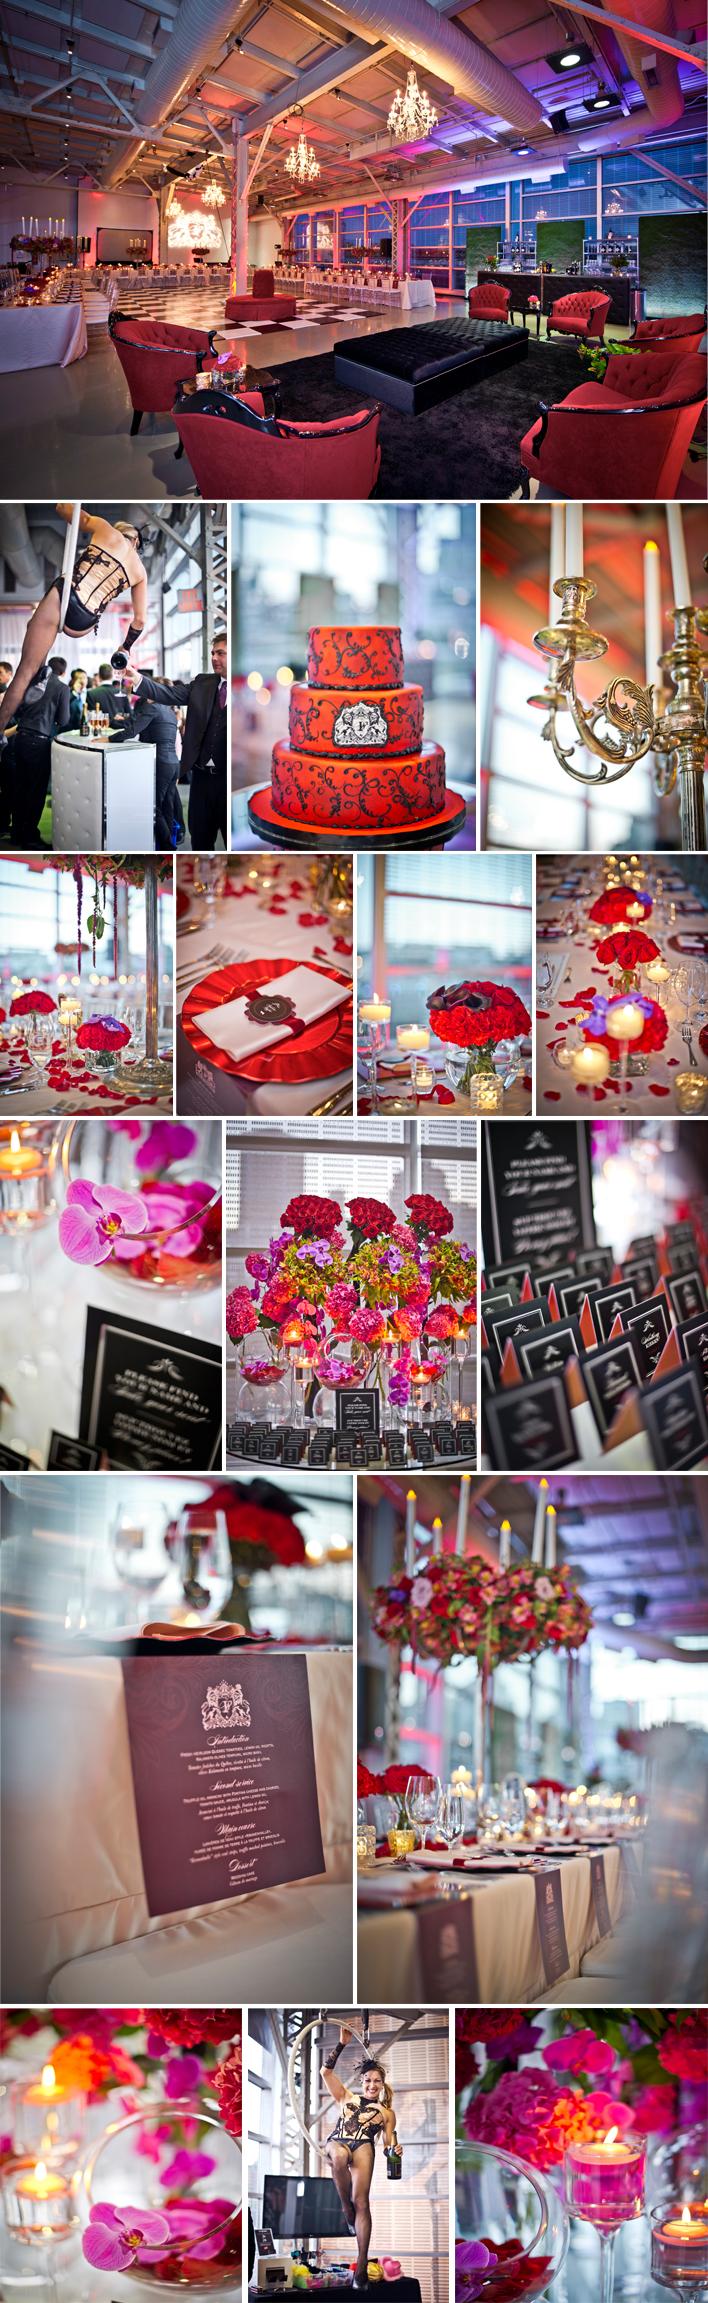 Montreal Wedding Photography | Venue Details | Hotel Le St-James | Science Center | Old Port | LindsayMuciyPhotography